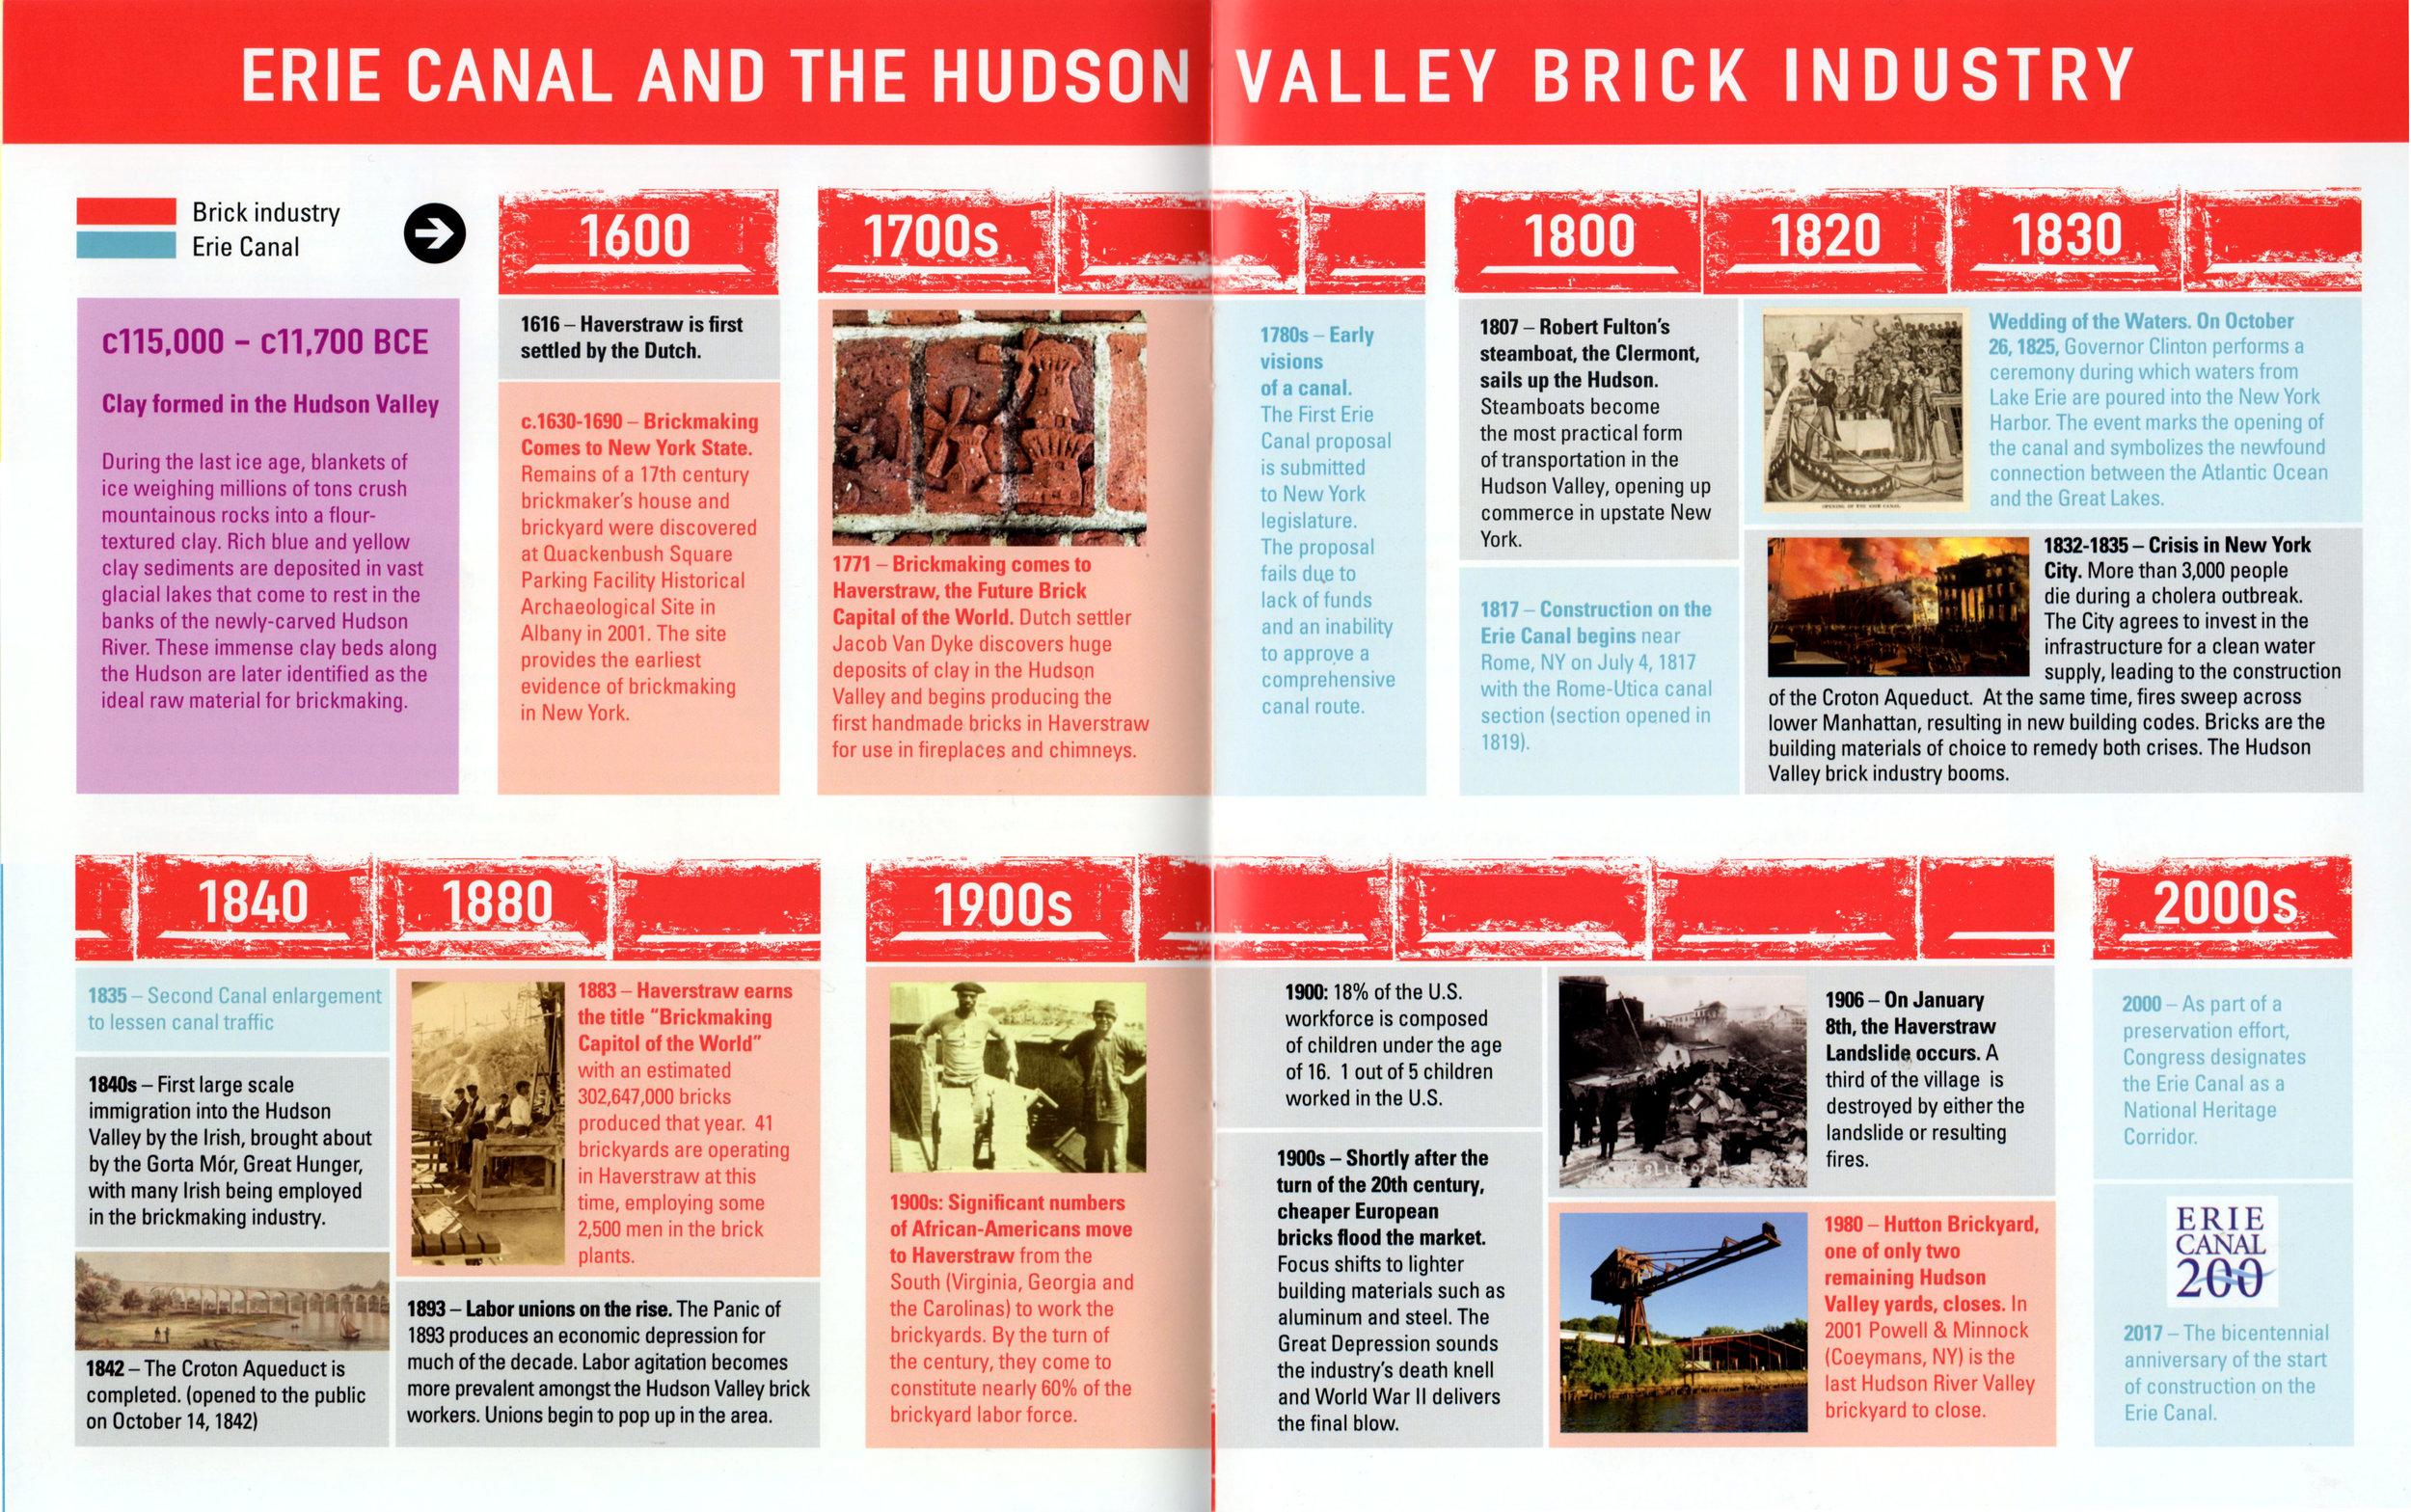 """Brick by Brick"" timeline"